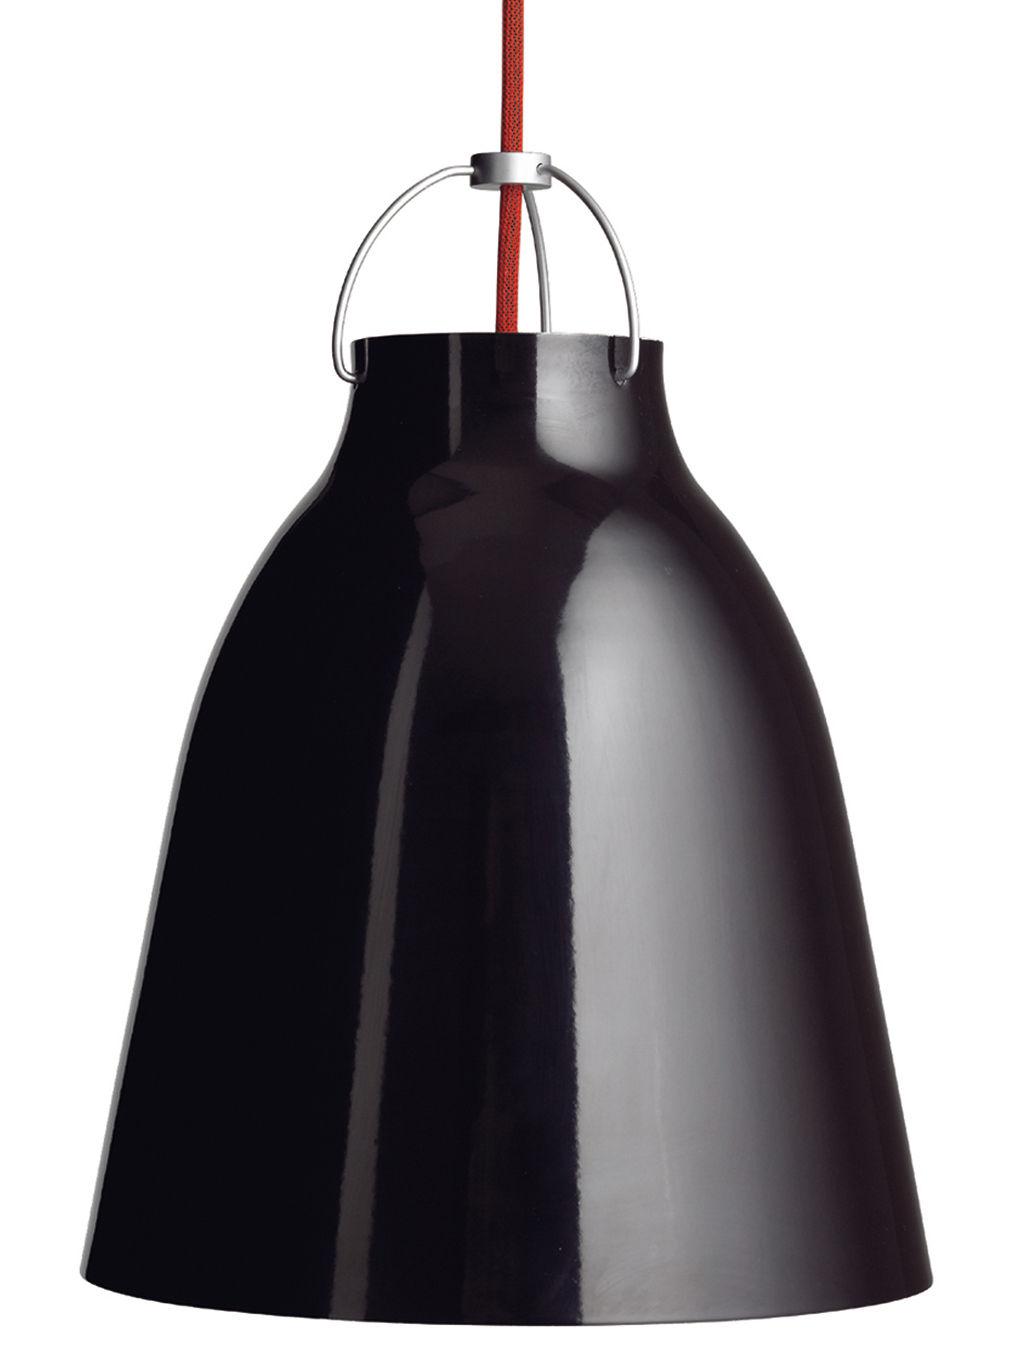 Lighting - Pendant Lighting - Caravaggio Small Pendant by Lightyears - Black - Ø 16,5 cm - Lacquered aluminium